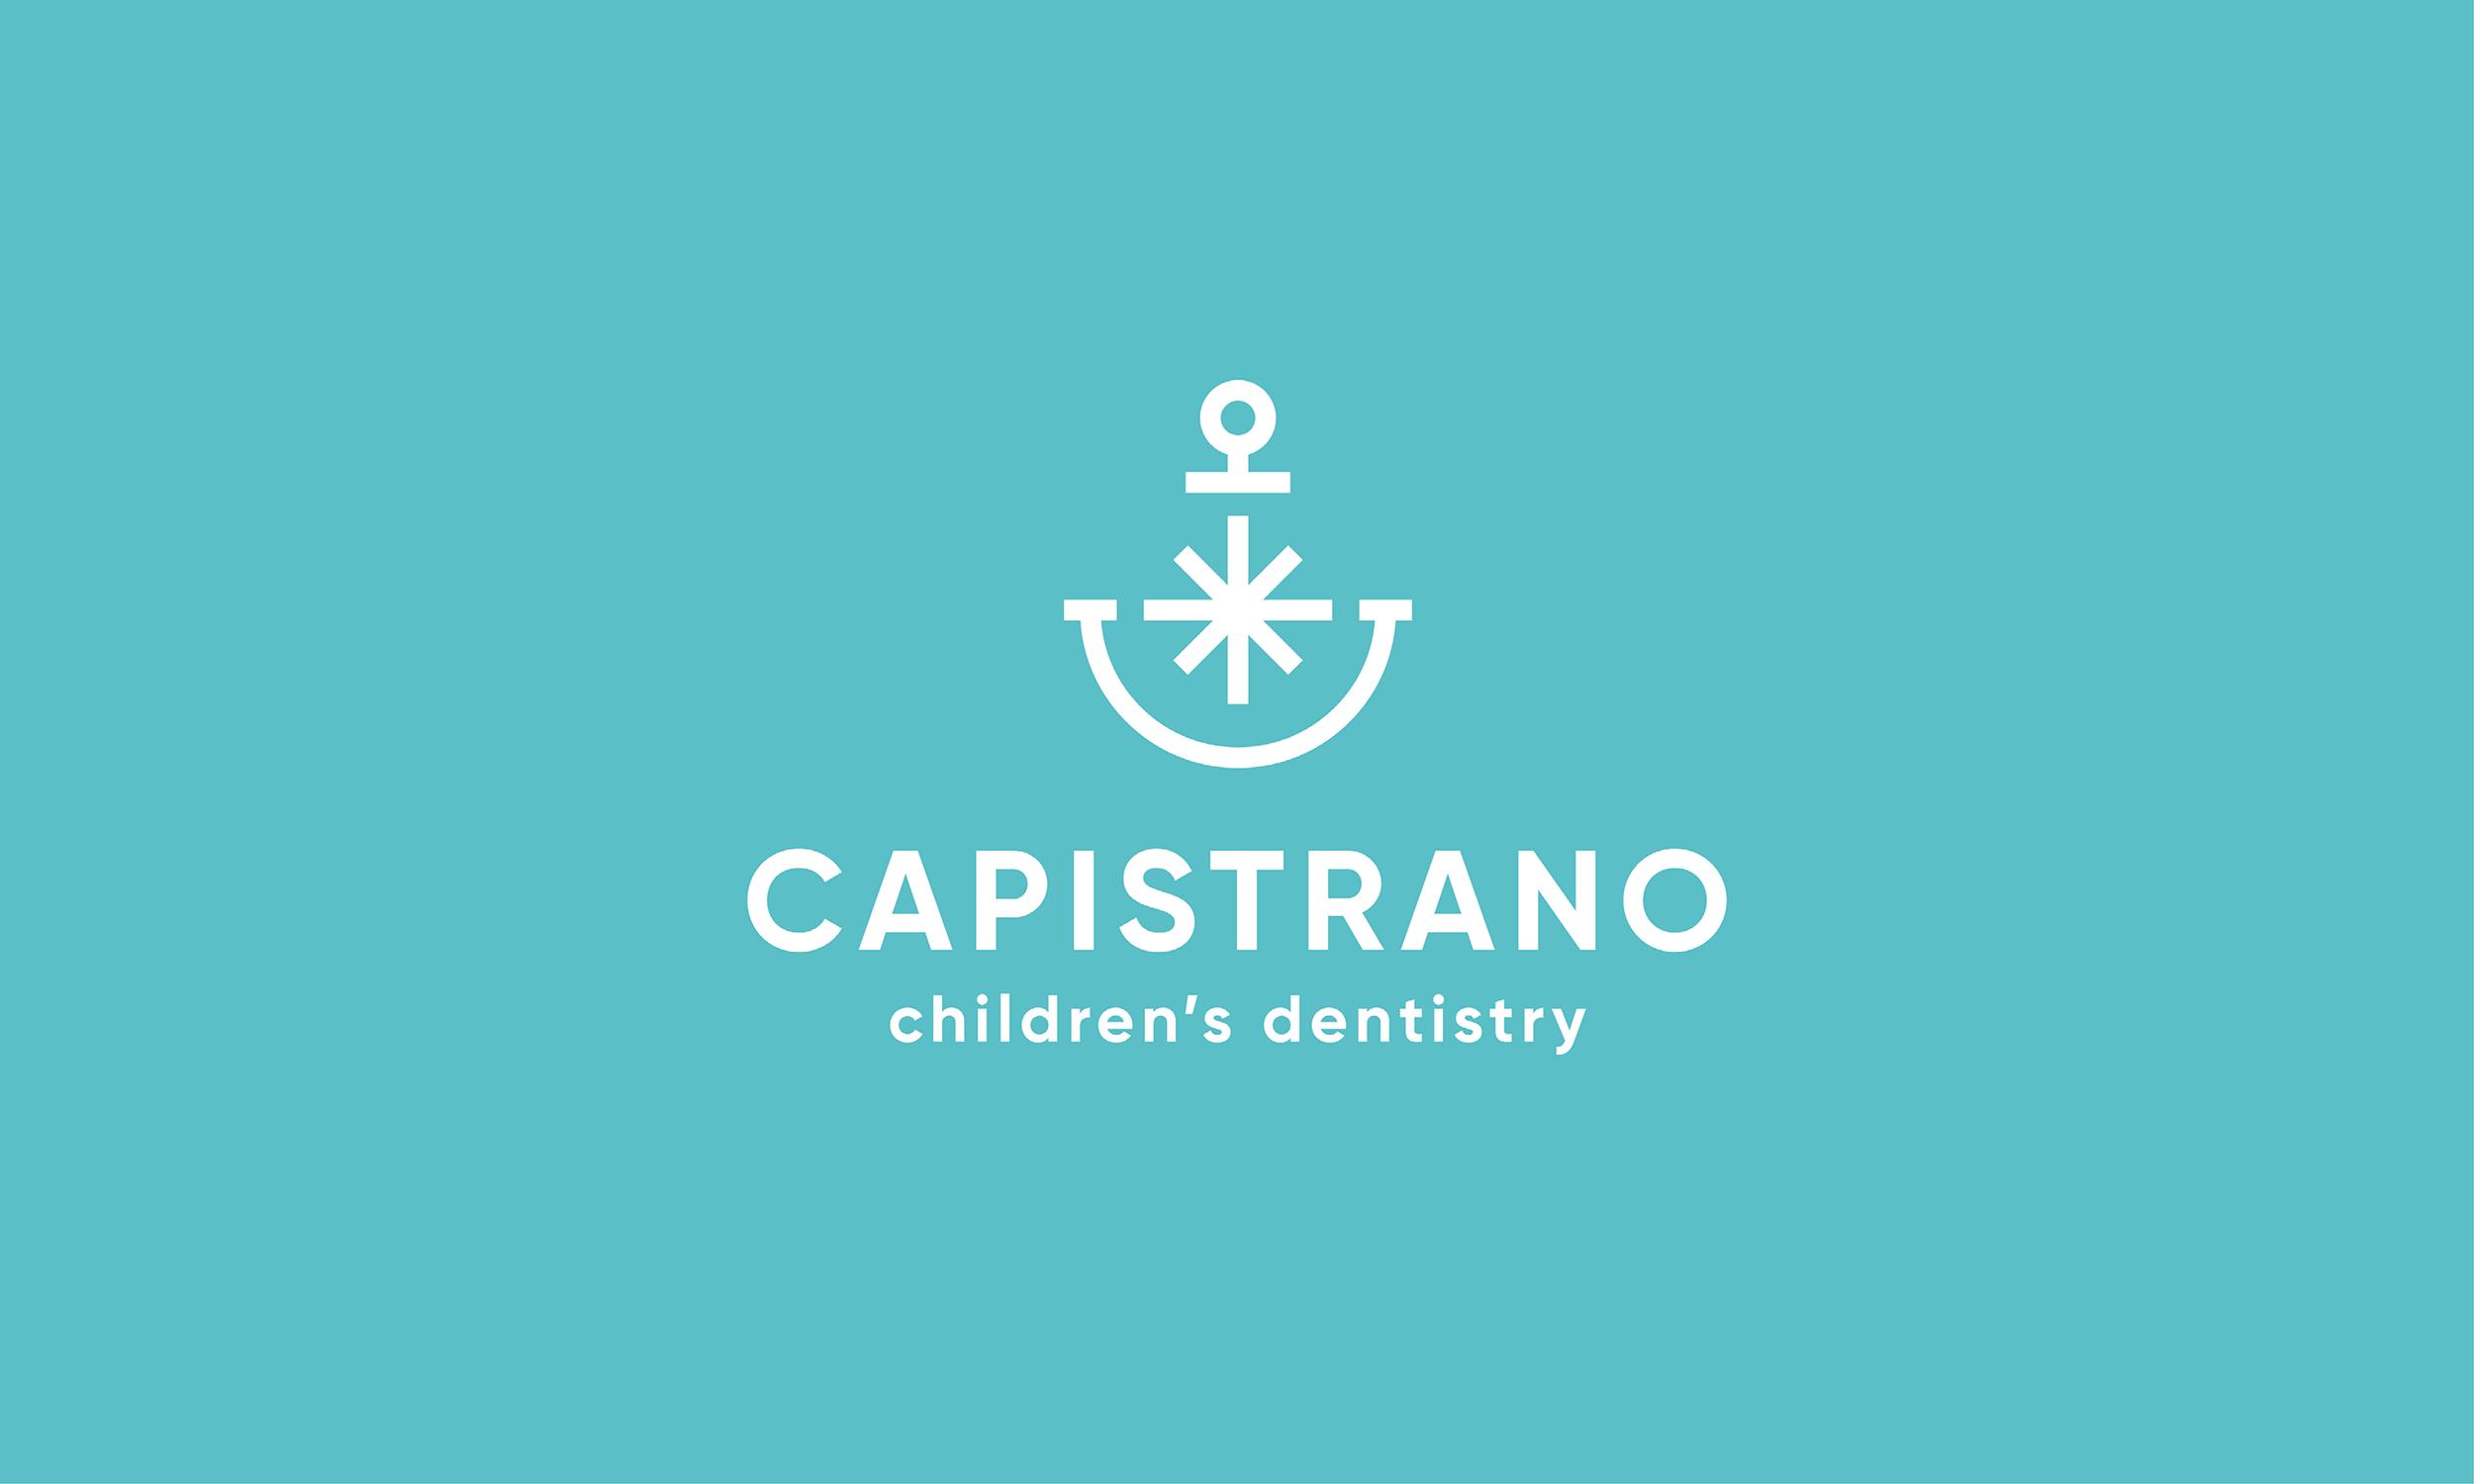 Capistrano-Childrens-Dentistry-Logo-Design-Freelance-Graphic-Designer-Margate-Kent-Presentation-Pediatric-Dental-Logo